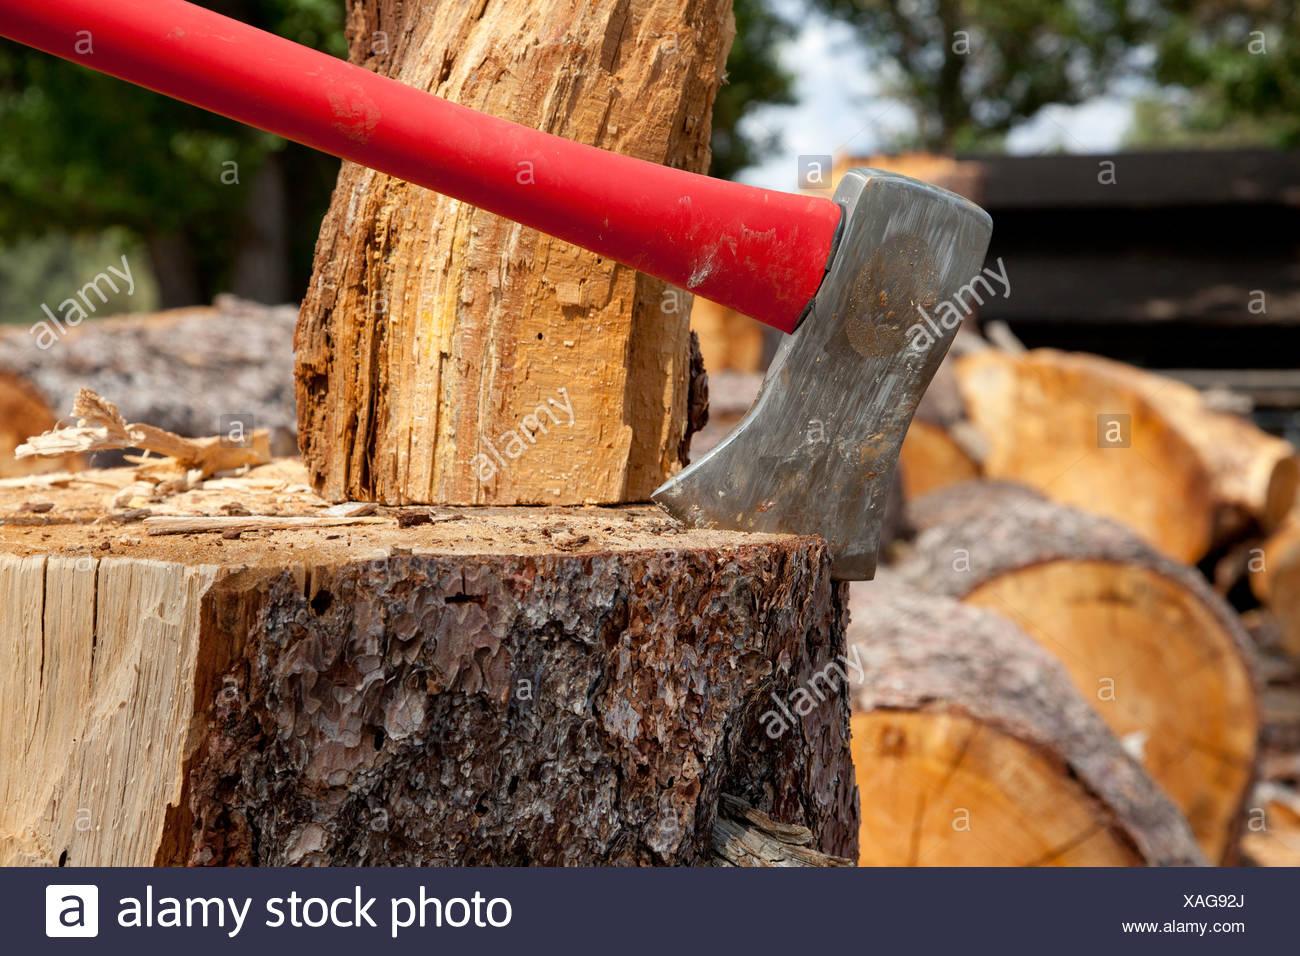 Axe wedged into tree stump - Stock Image